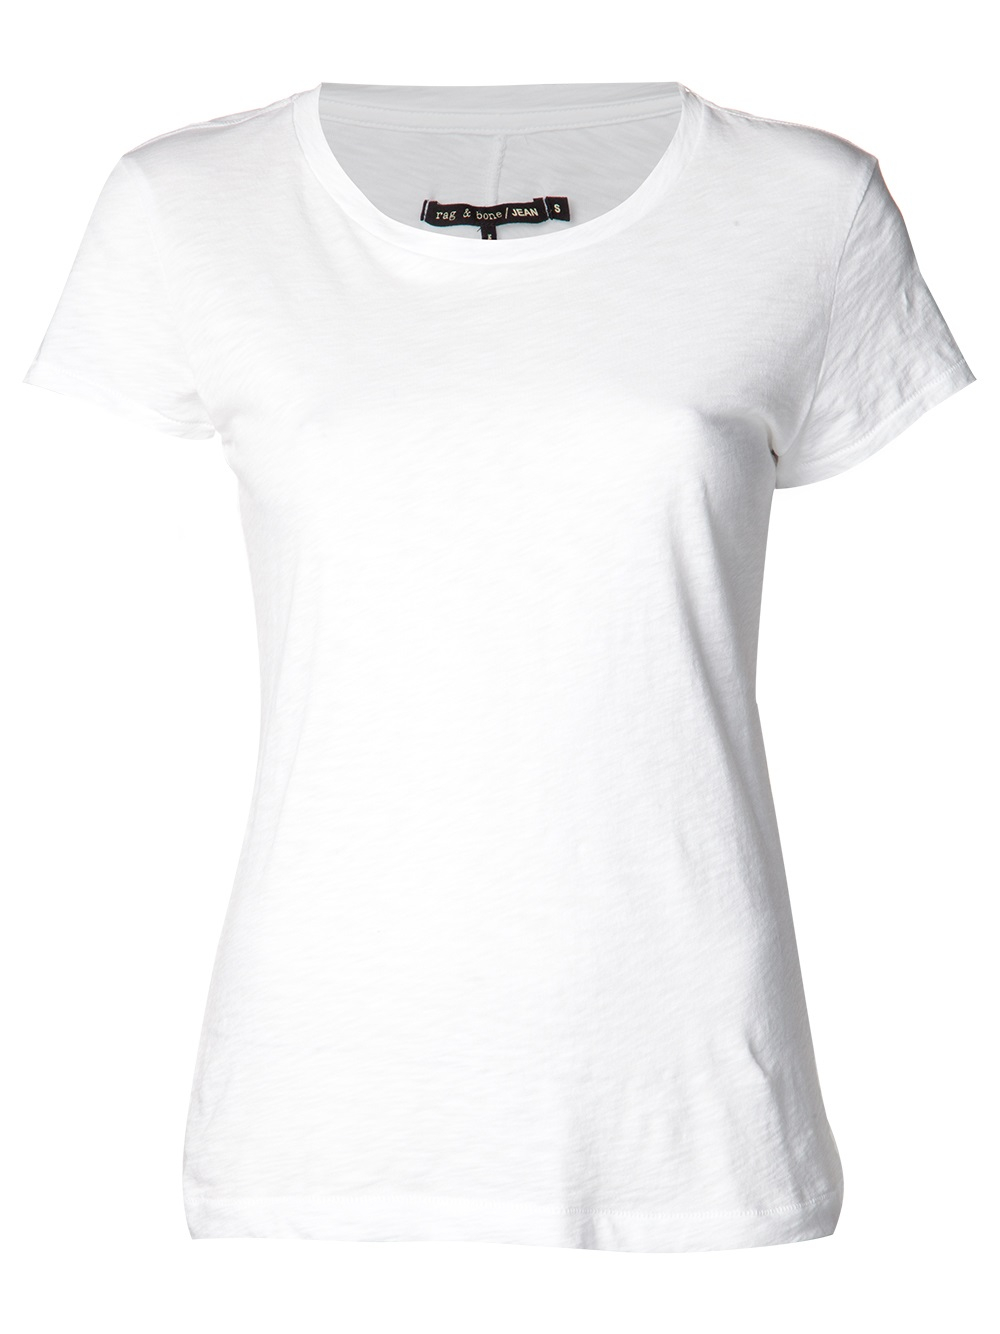 Rag bone 39 brando 39 t shirt in white lyst for Rag and bone t shirts